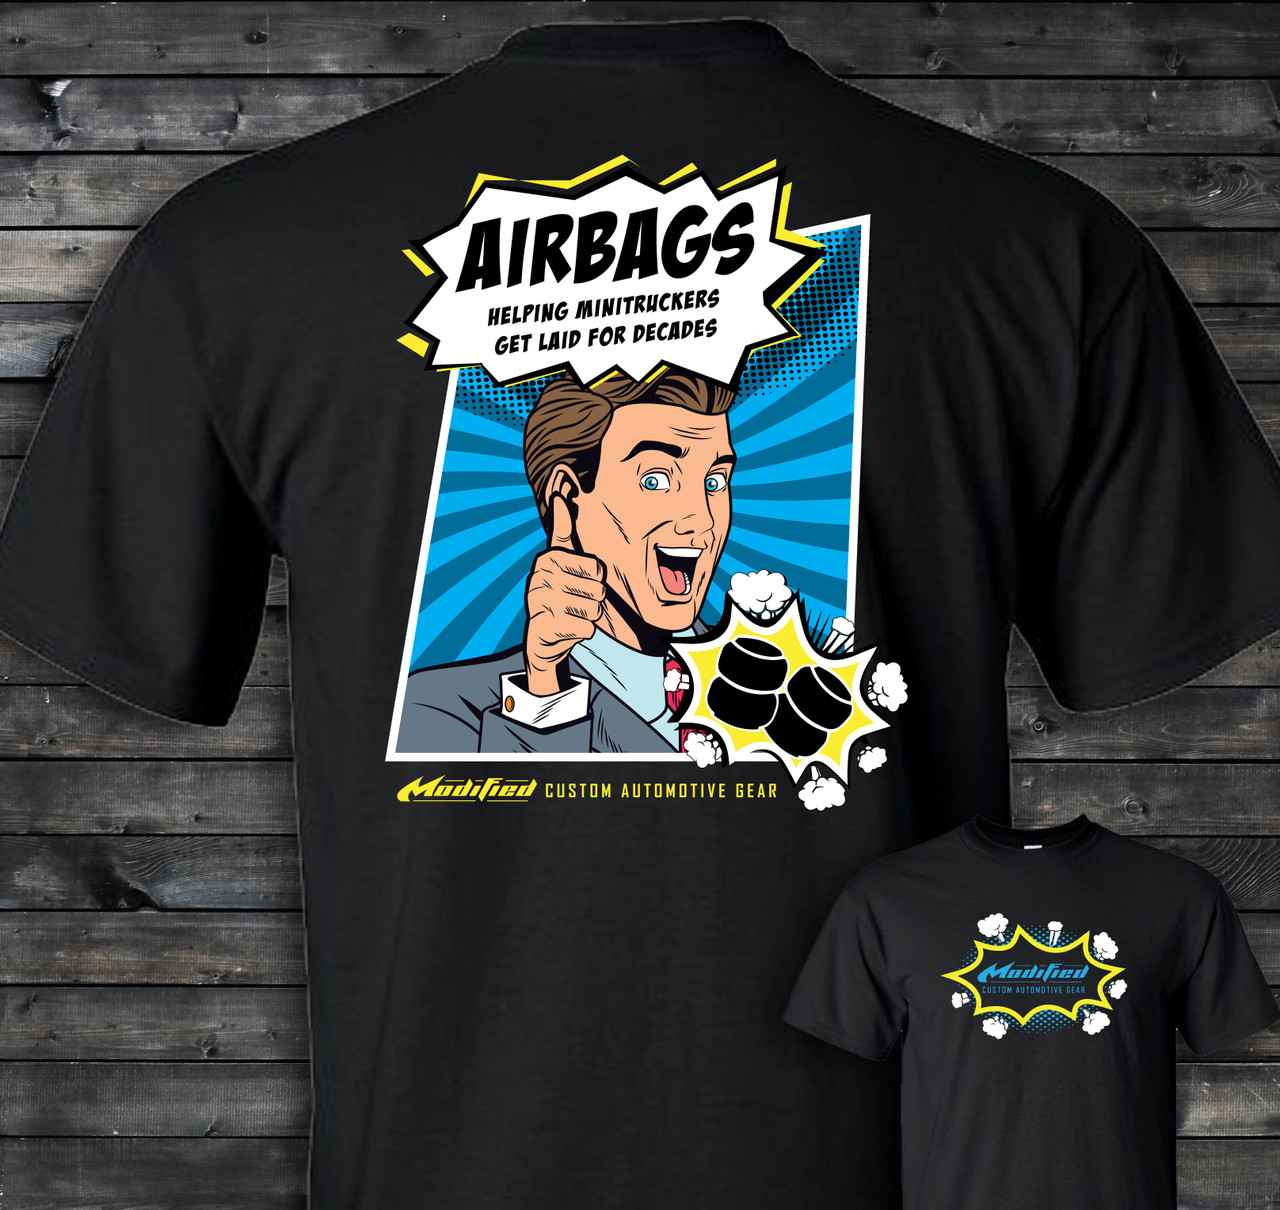 Modified T-Shirts